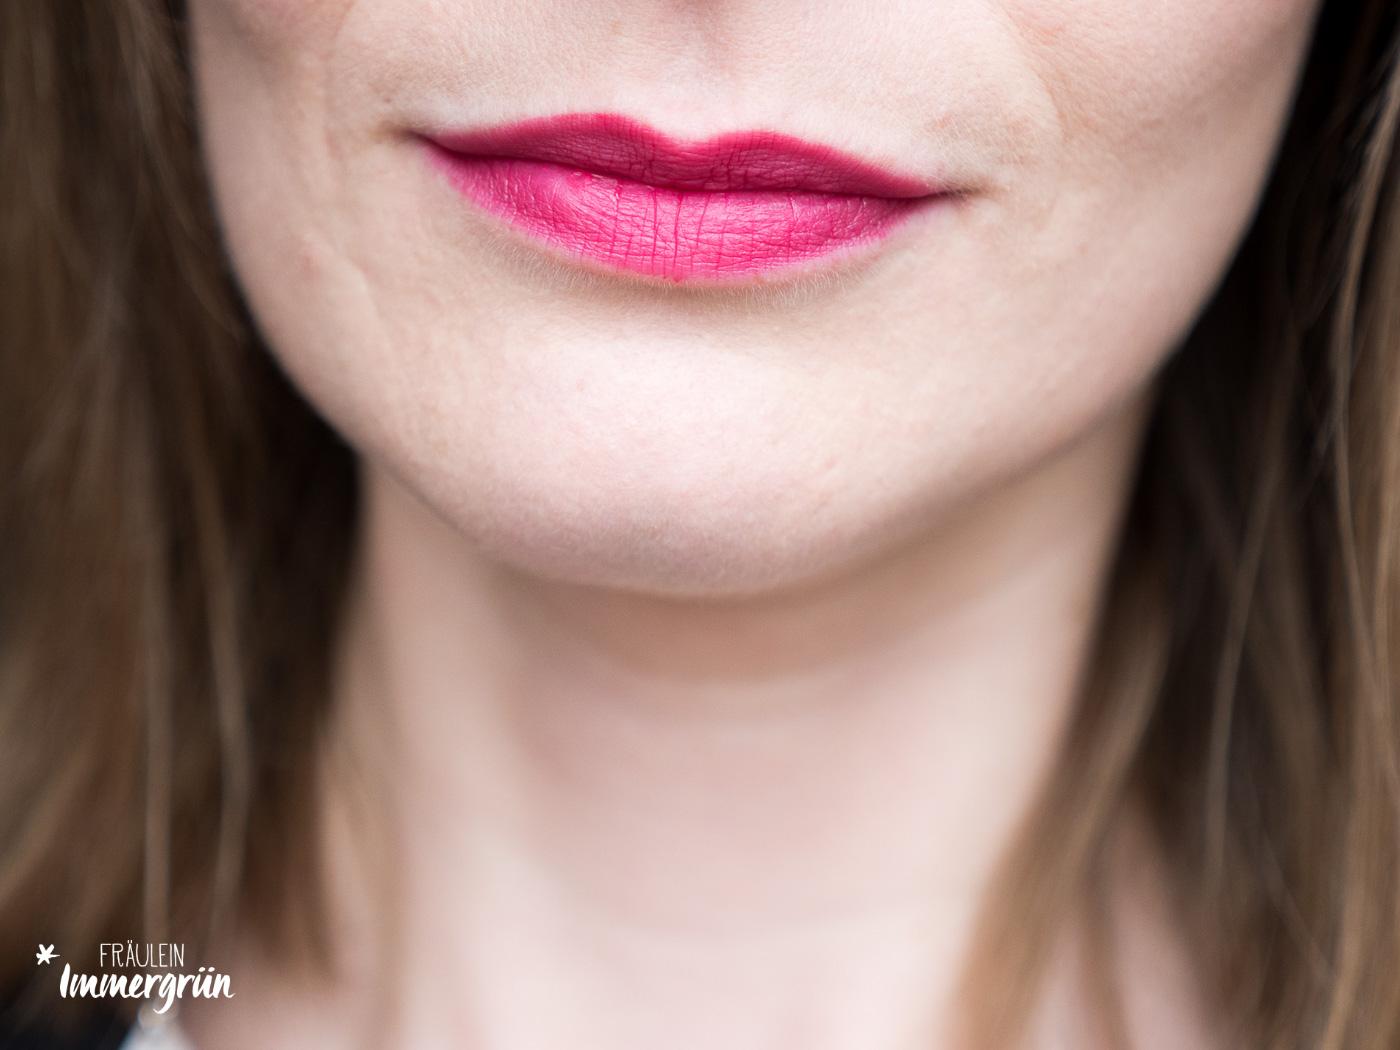 100 Percent Pure natuerlicher Lippenstift: Tragefoto von Pomegranate Oil Anti Aging Lipstick Narcissus – Stain. Vegane Naturkosmetik.